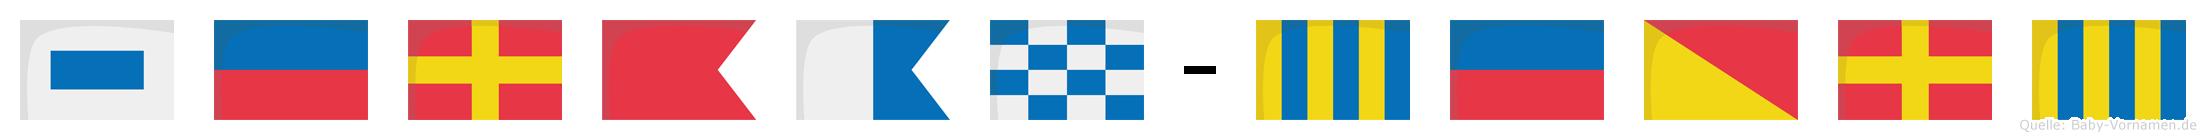 Serban-Georg im Flaggenalphabet